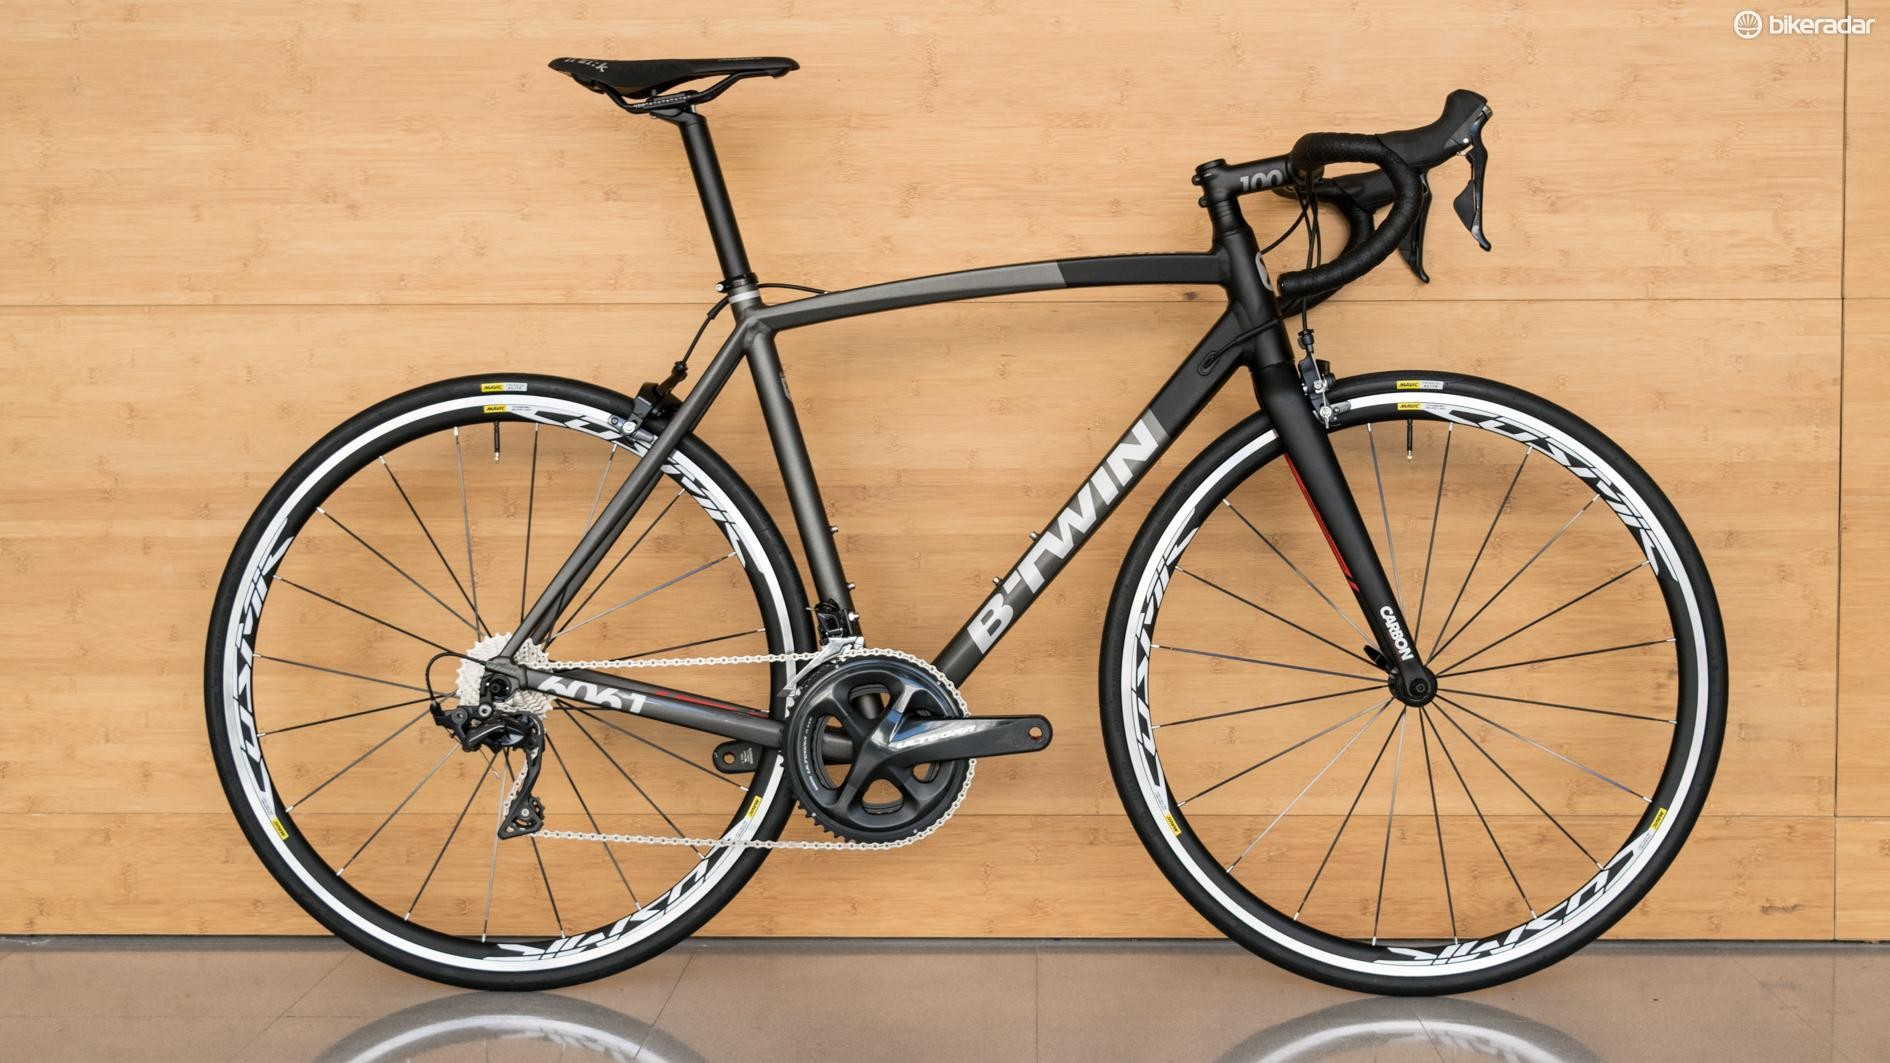 More-or-less full Ultegra R8000 and Mavic Cosmic Elite UST wheels make for a pleasing build